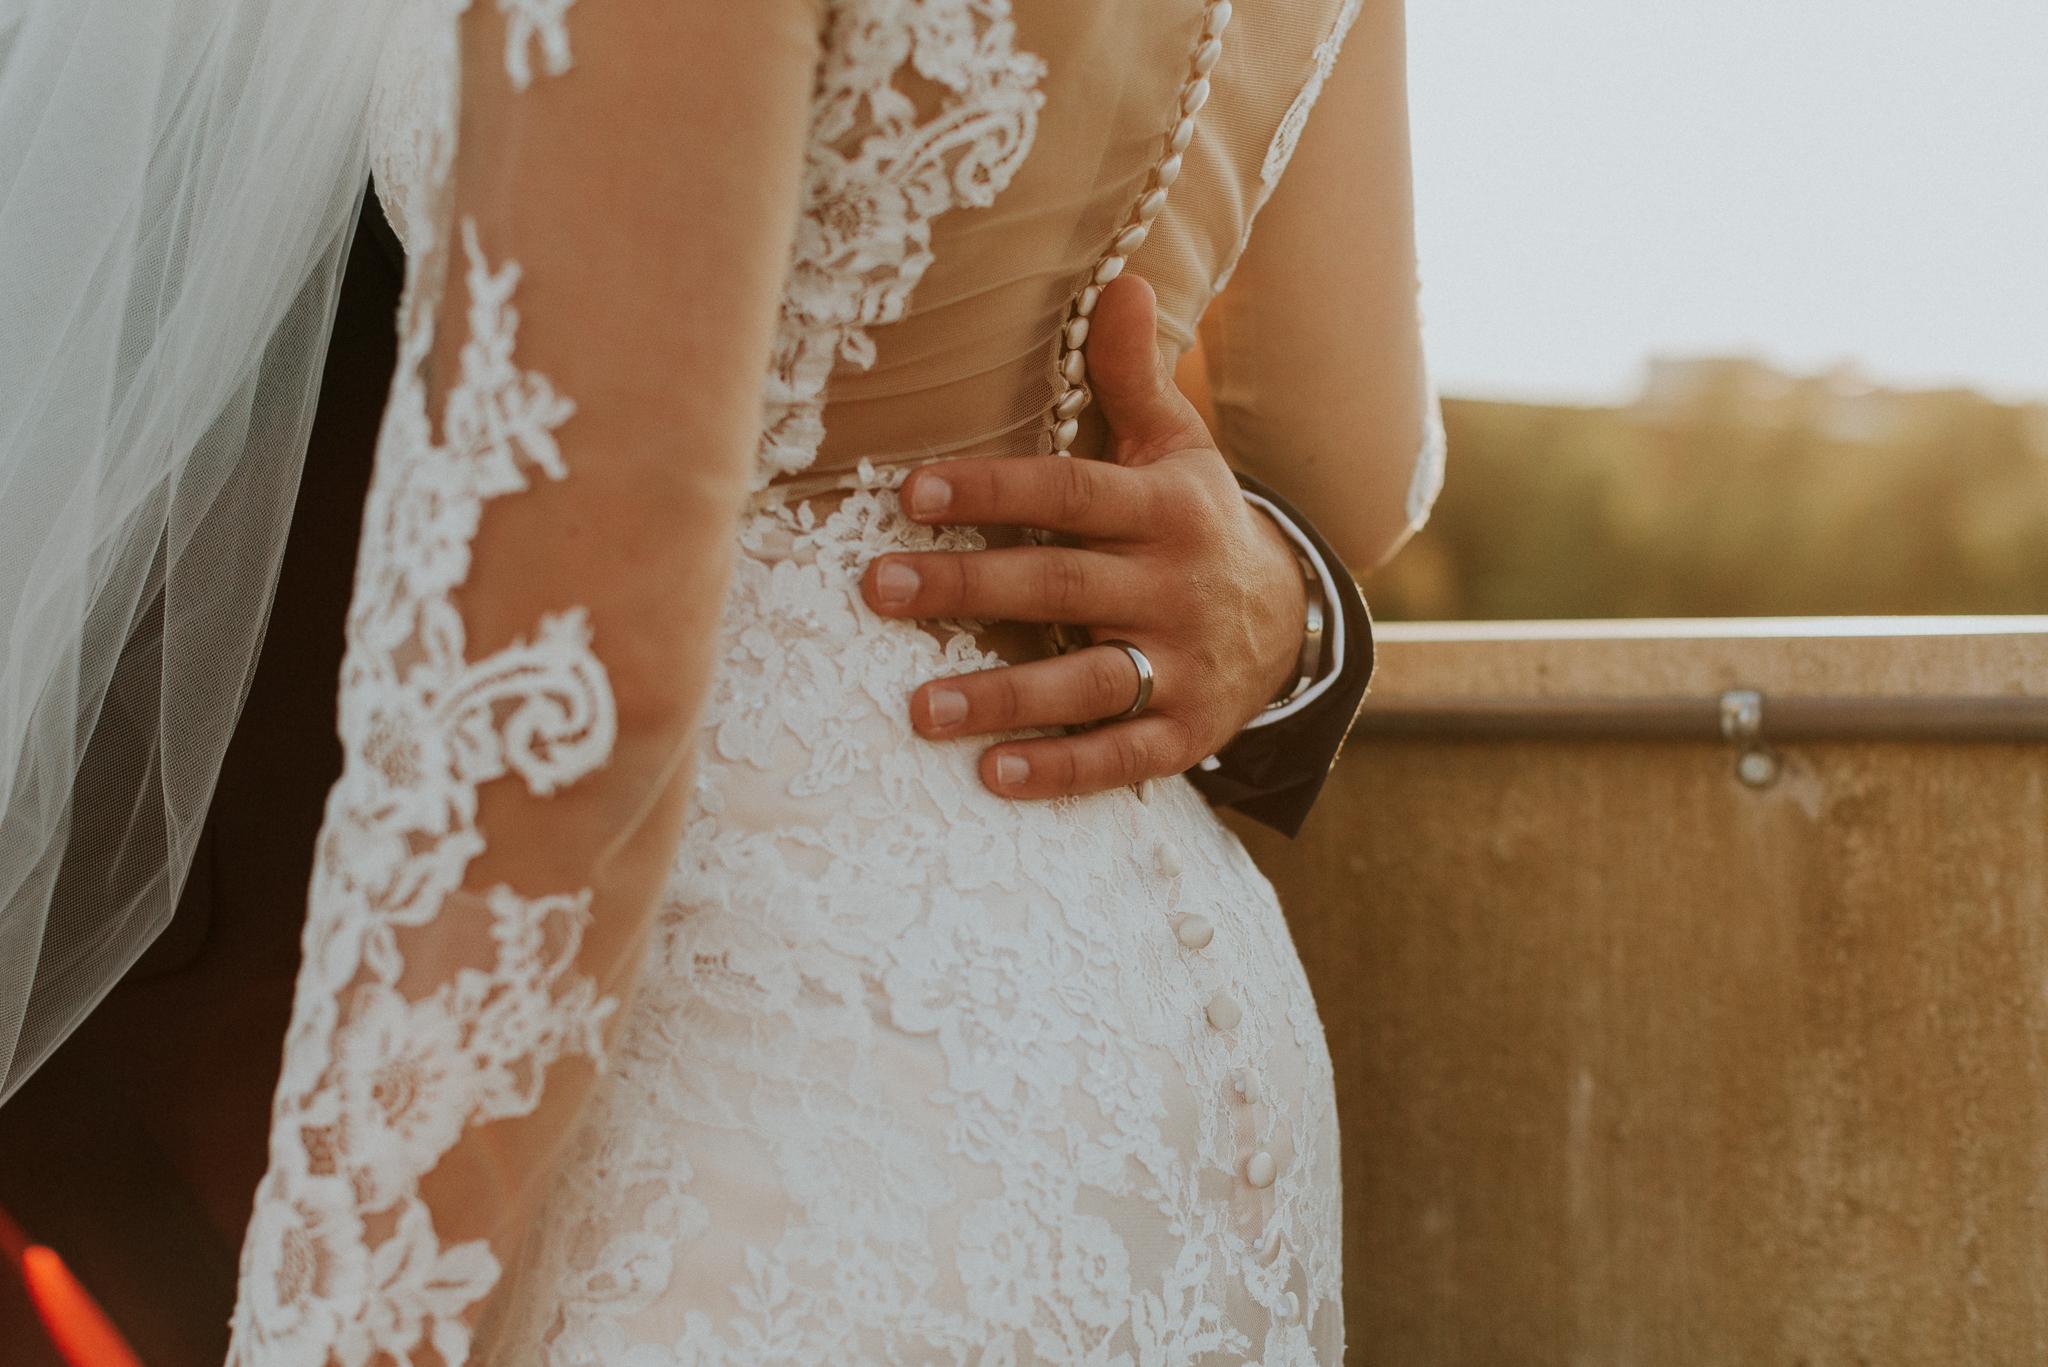 east-tn-wedding-photographer-tennessee-elopement-photographer-kingsport-tn-wedding-photographer (41 of 50).jpg